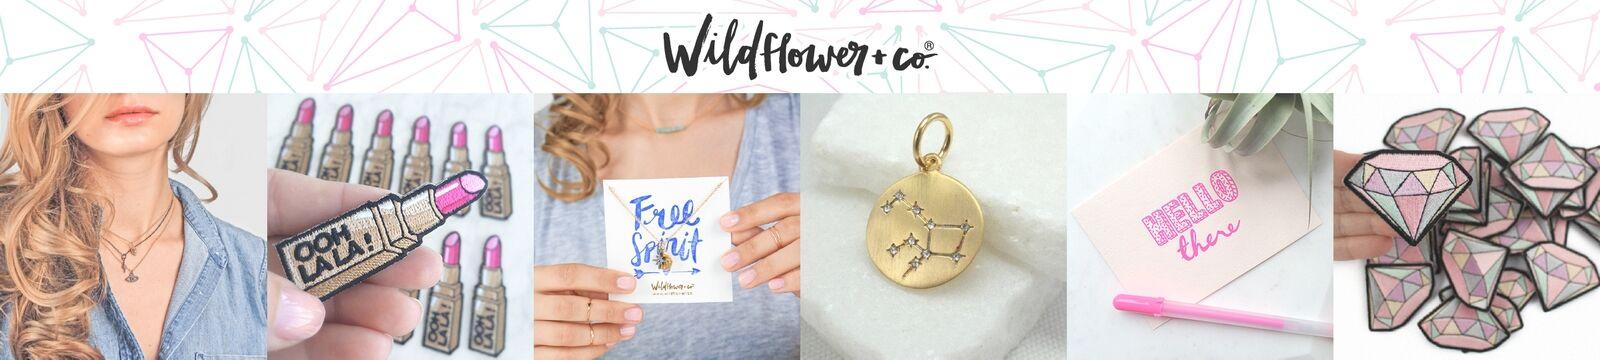 Wildflower Co